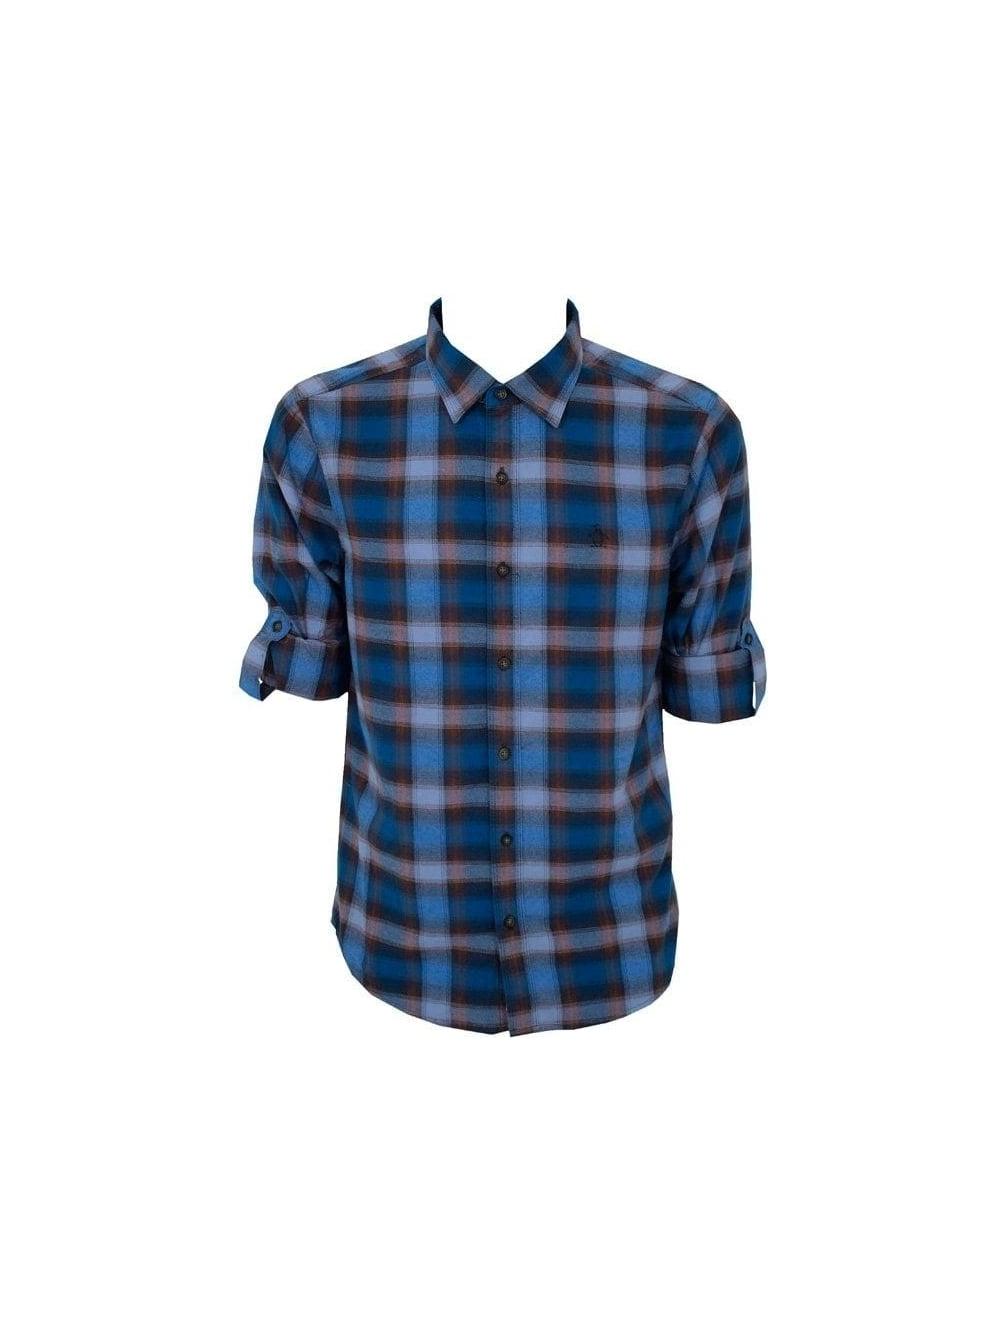 264e36d9 Penguin Polo Shirts Sale Uk - DREAMWORKS